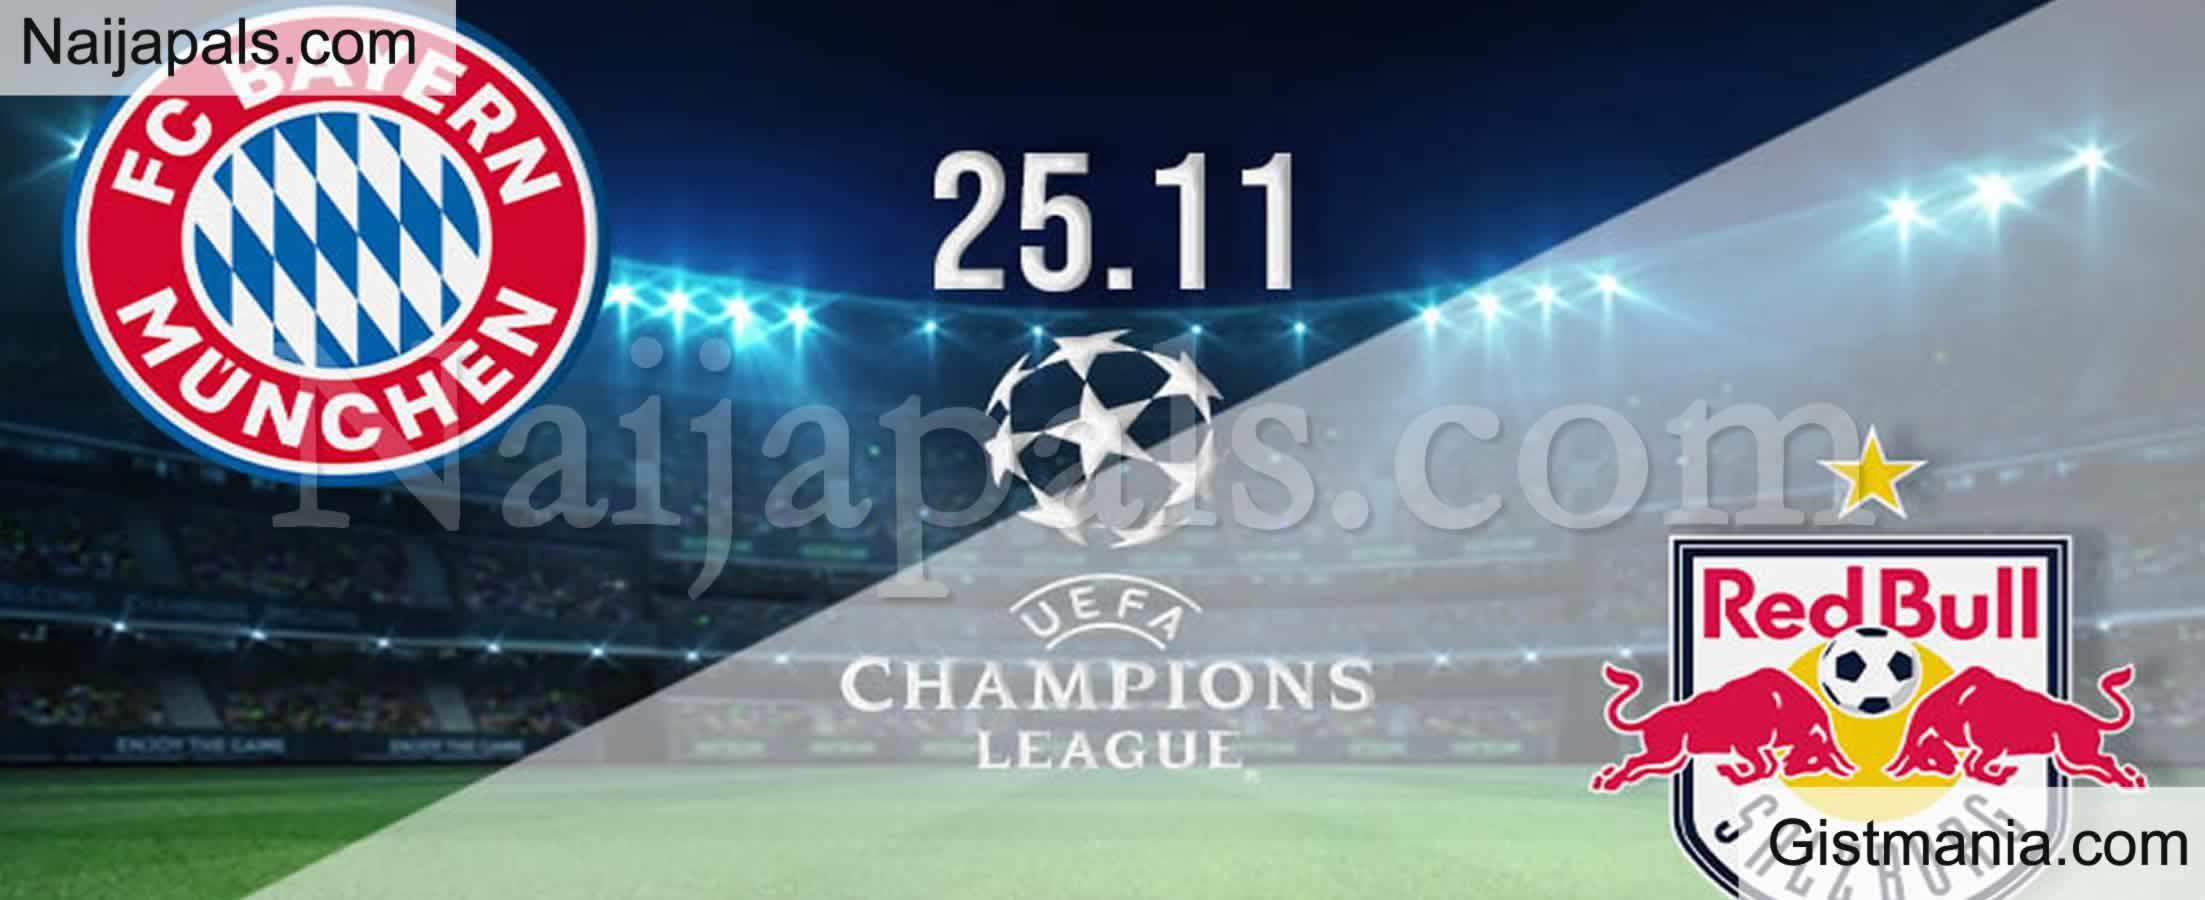 <img alt='.' class='lazyload' data-src='https://img.gistmania.com/emot/soccer.gif' /> <b>Bayern Munich v RB Salzburg : UEFA Champions League Match, Team News, Goal Scorers and Stats</b>